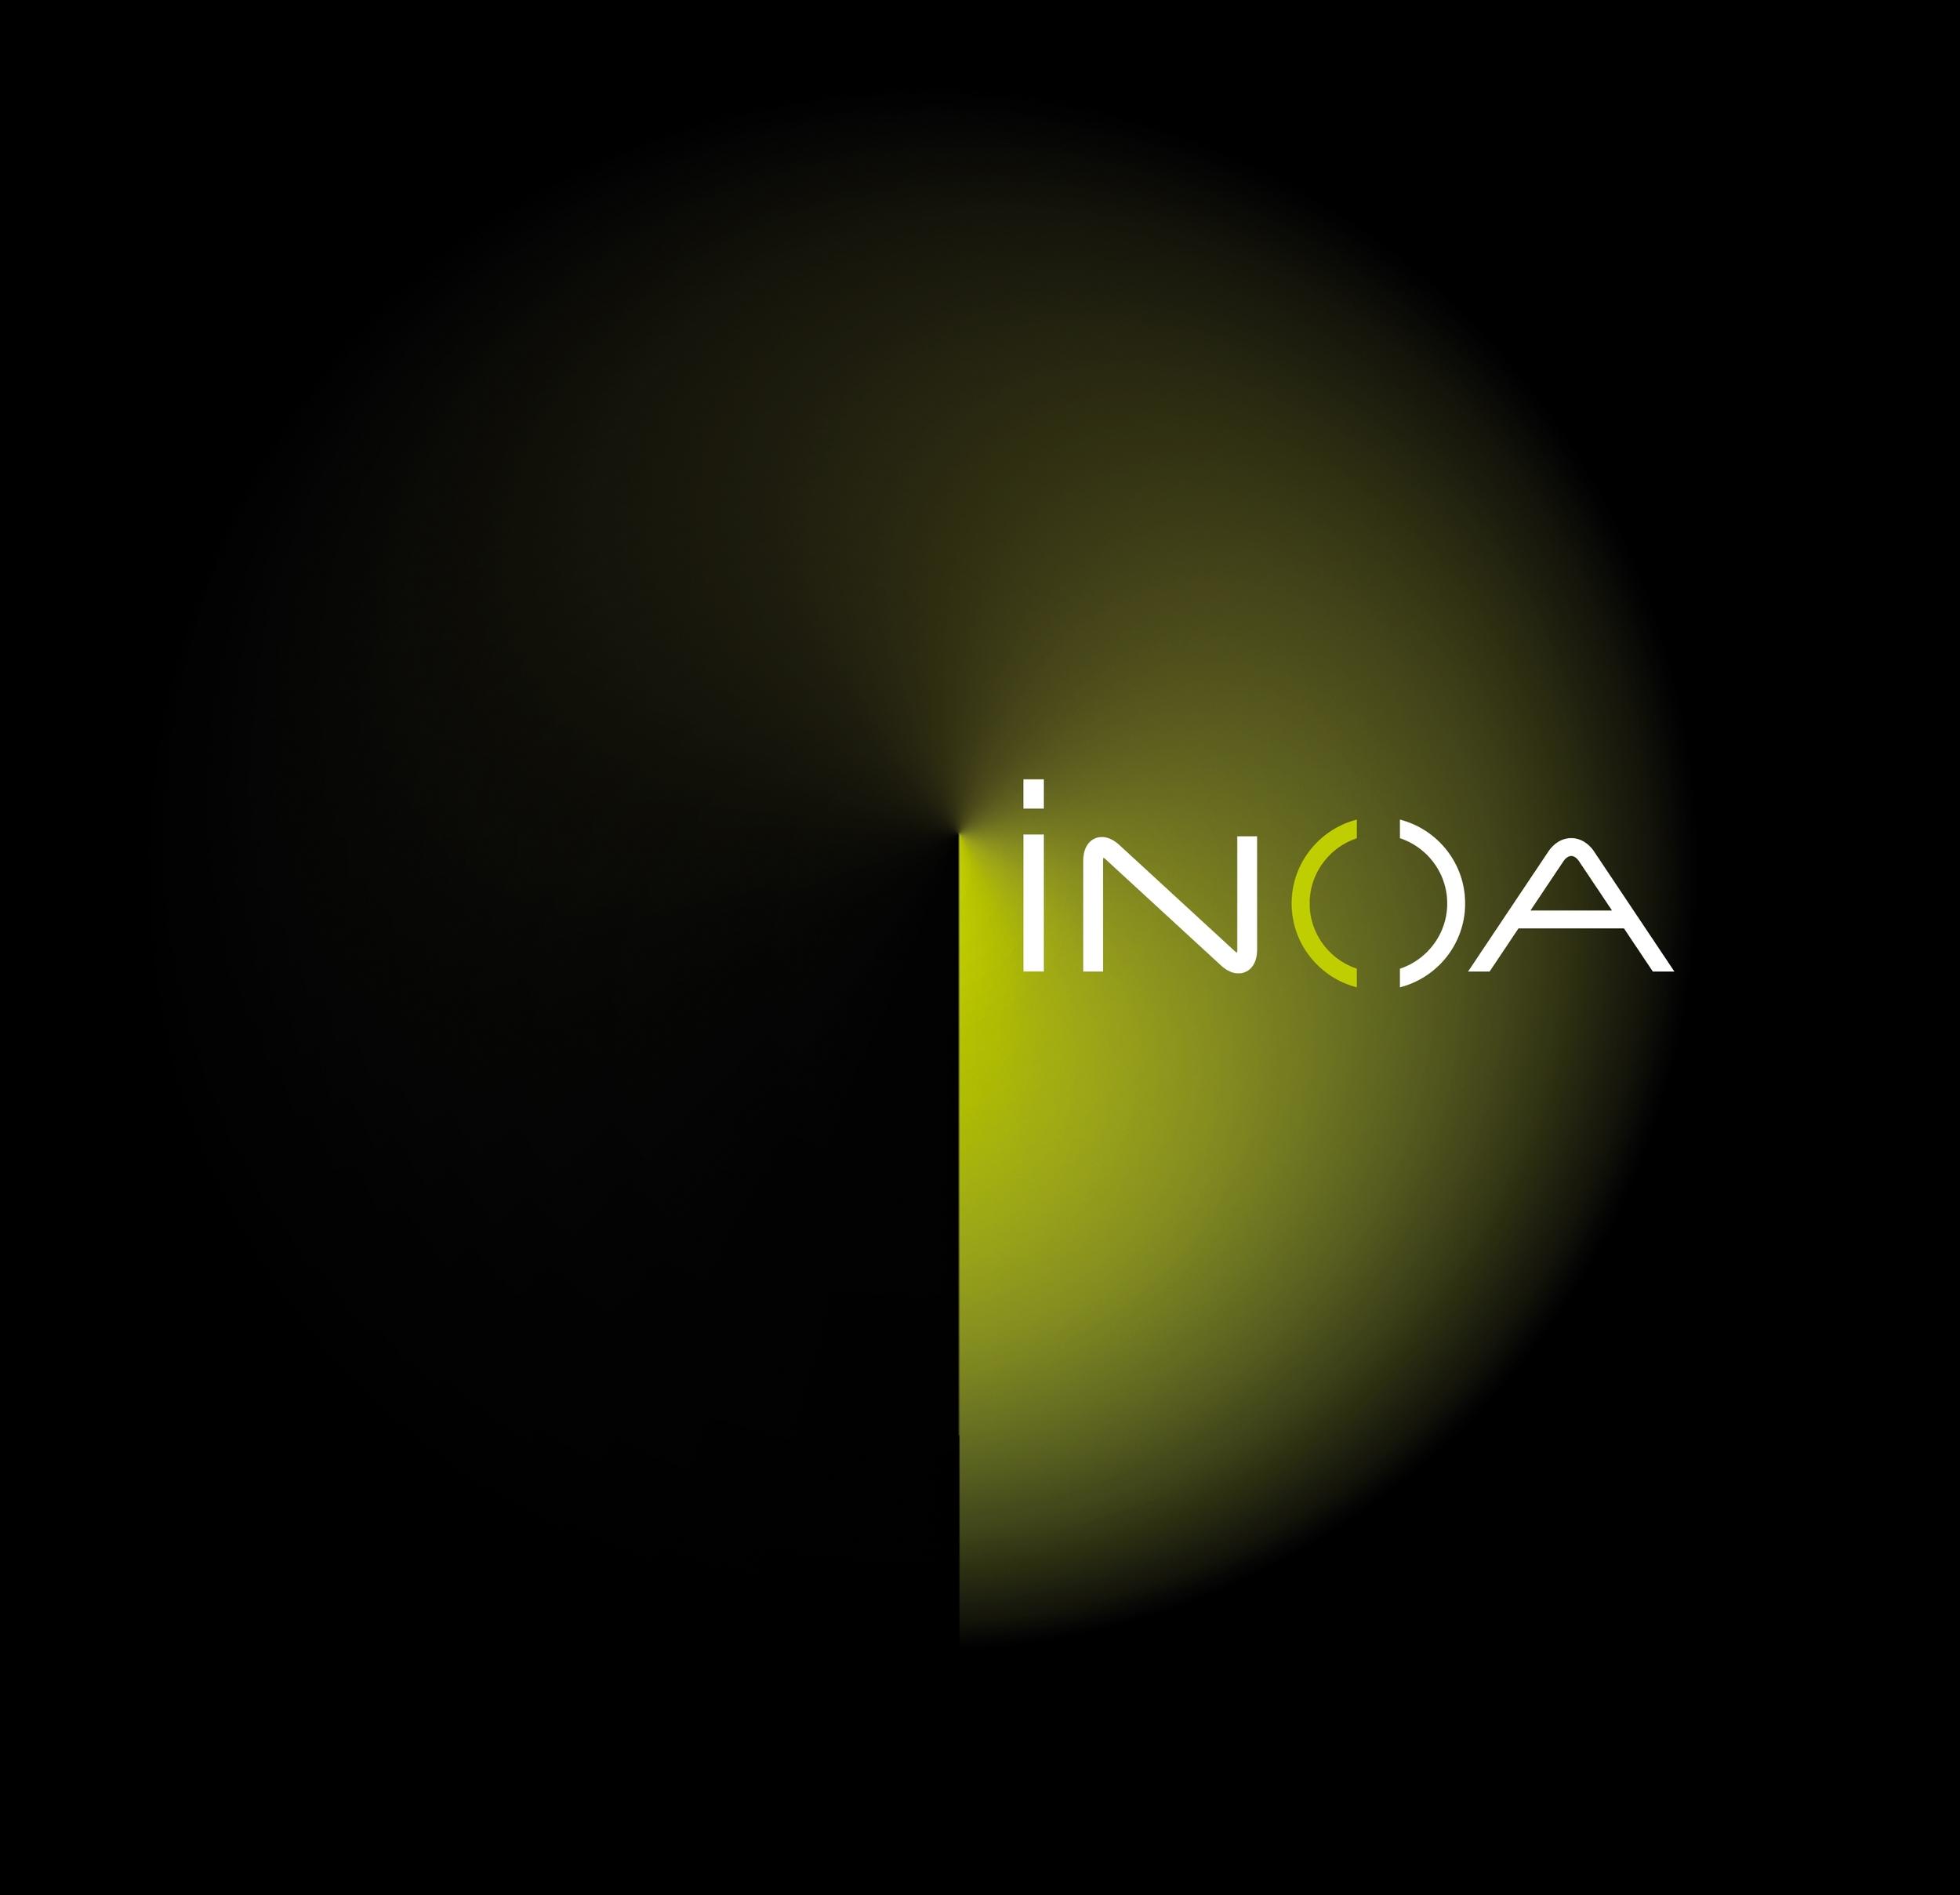 inoa_logo-black_rgb